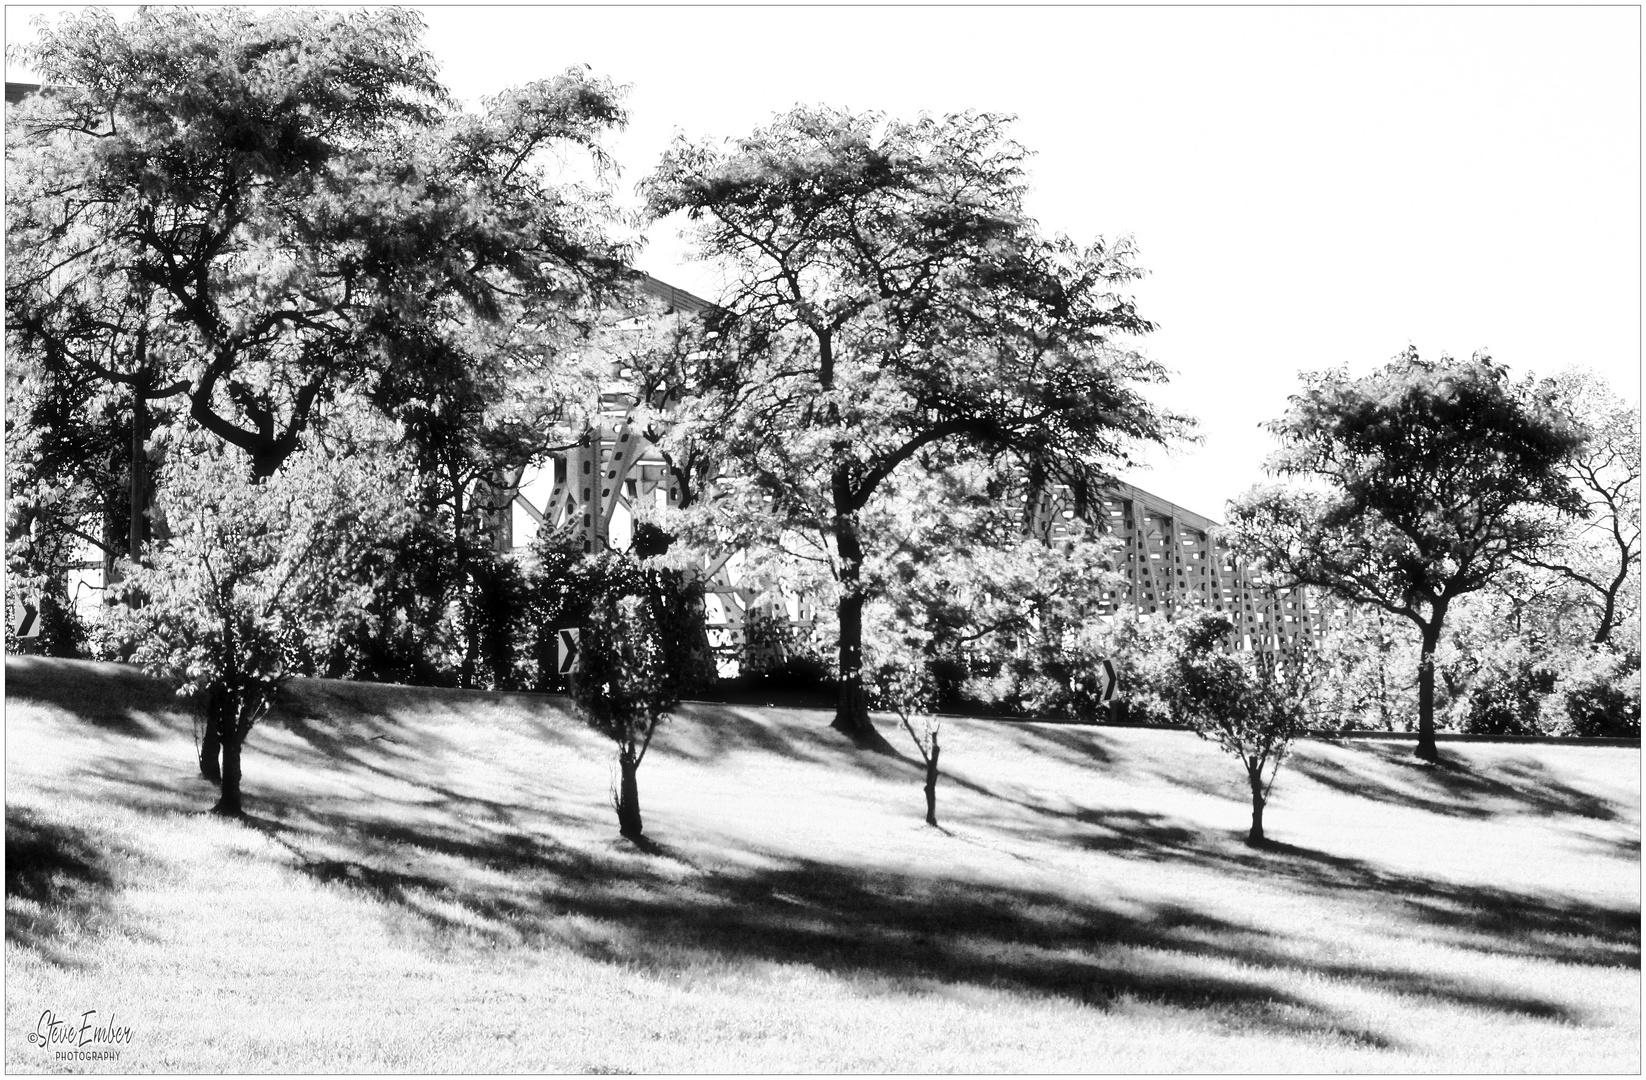 Bridge, Trees, Afternoon Shadows - A Baltimore Impression